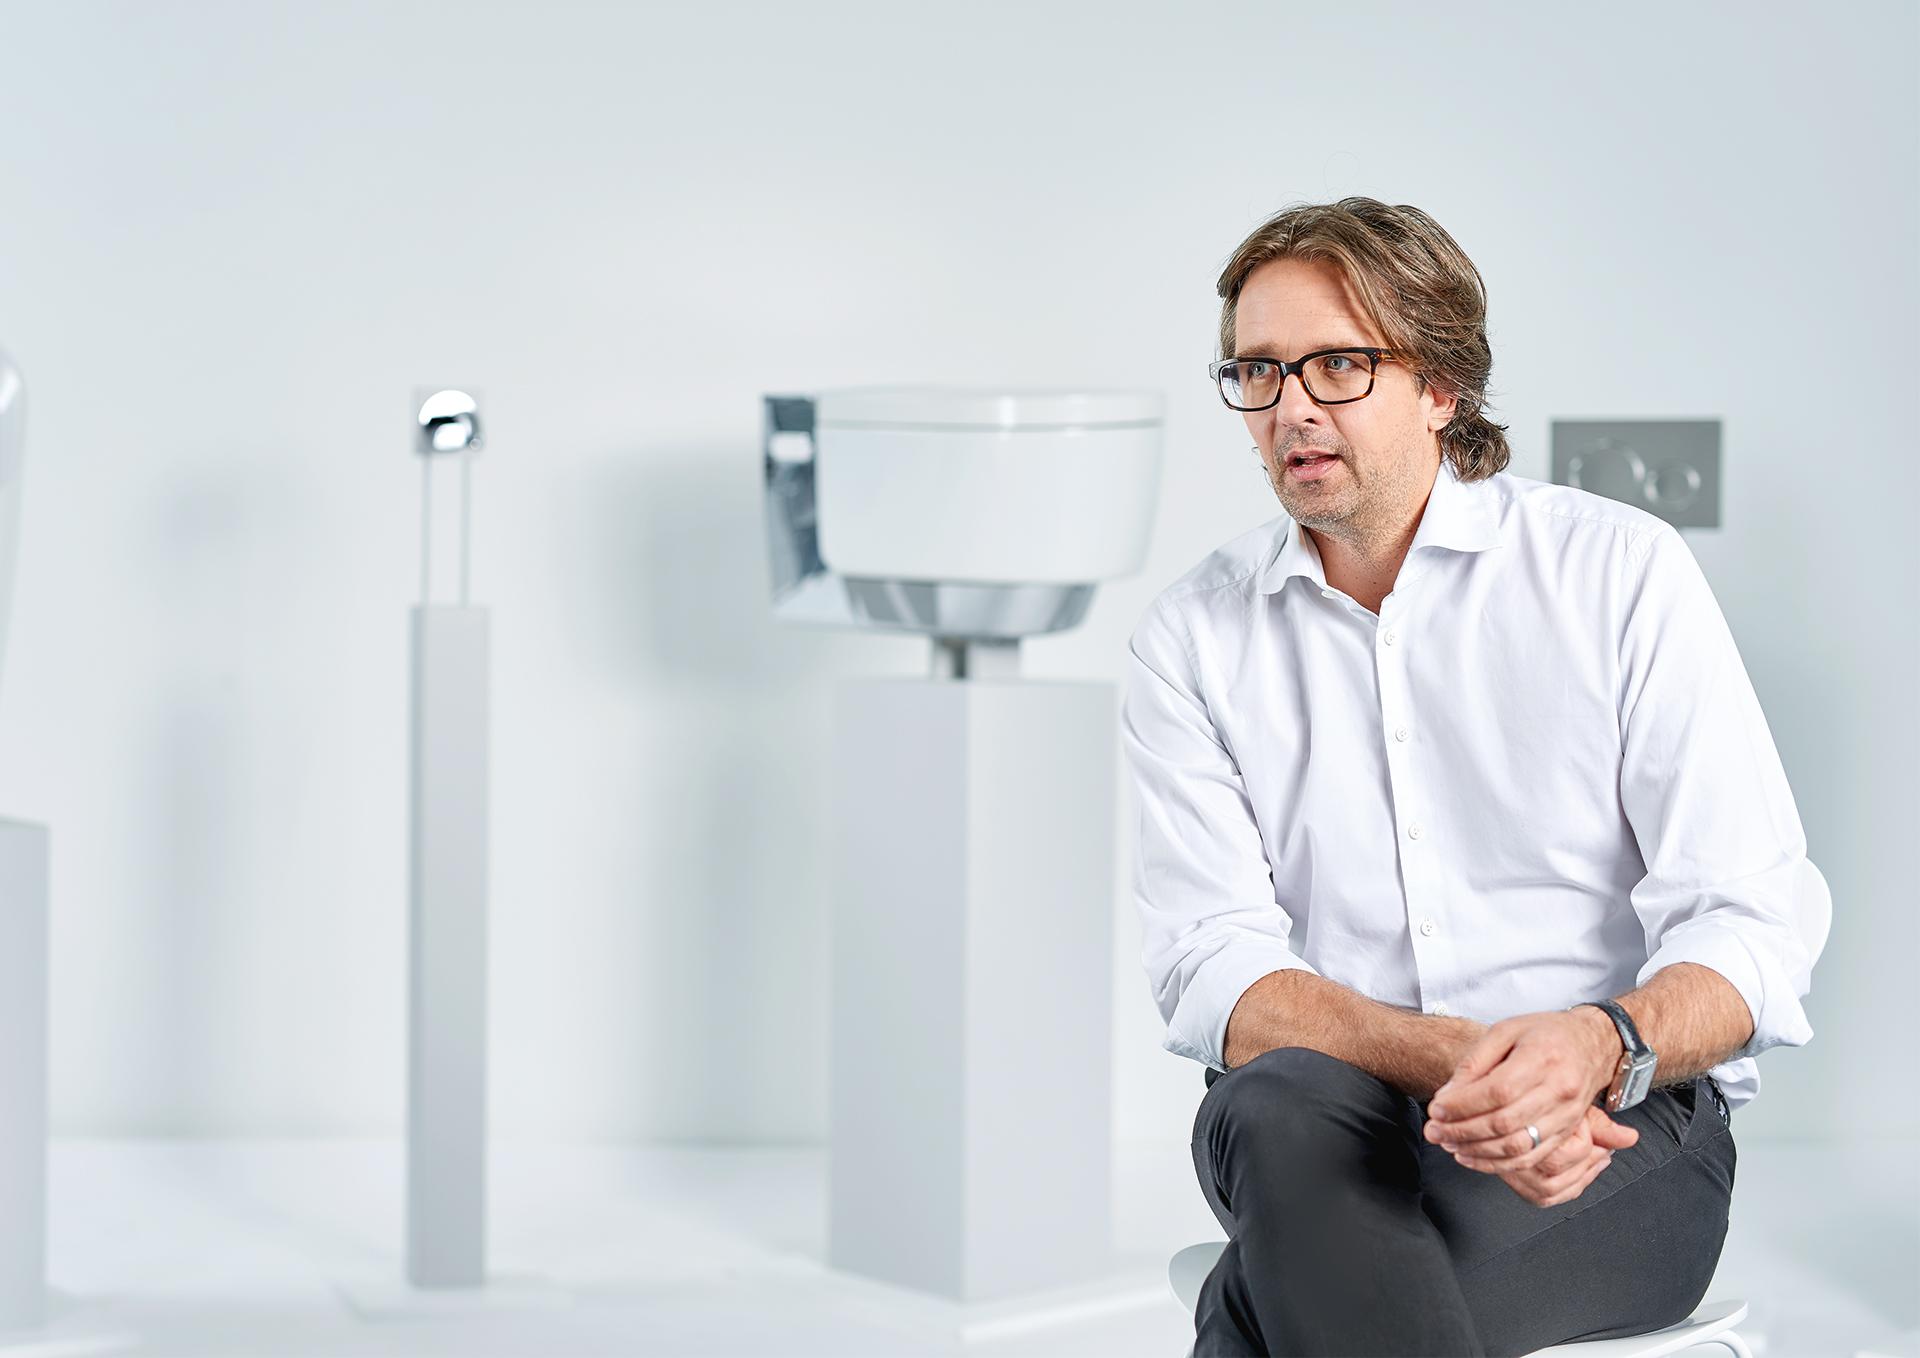 squarerooms-geberit-shower-toilet-engineer-christoph-behling-designer